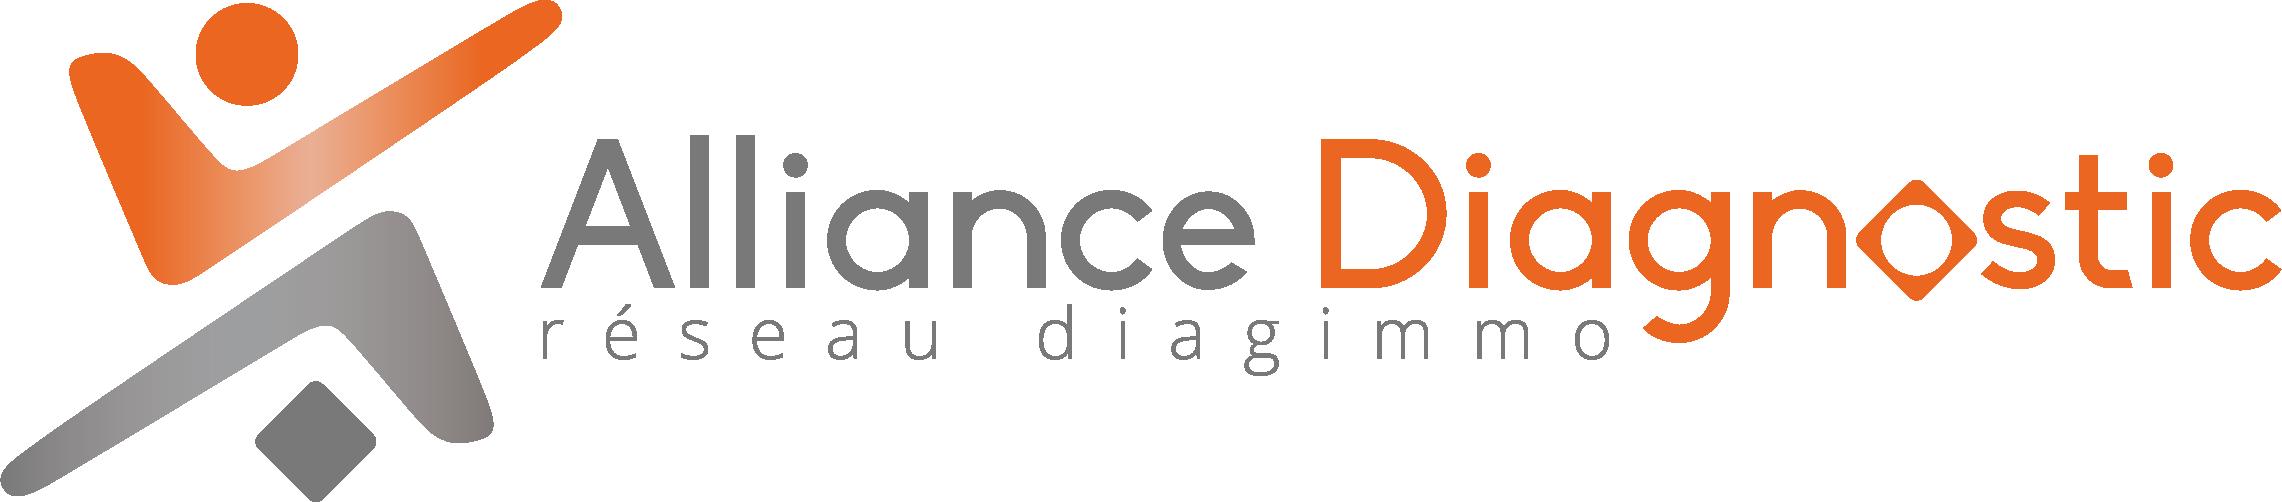 ALLIANCE DIAGNOSTIC-RESEAU DIAGIMMO